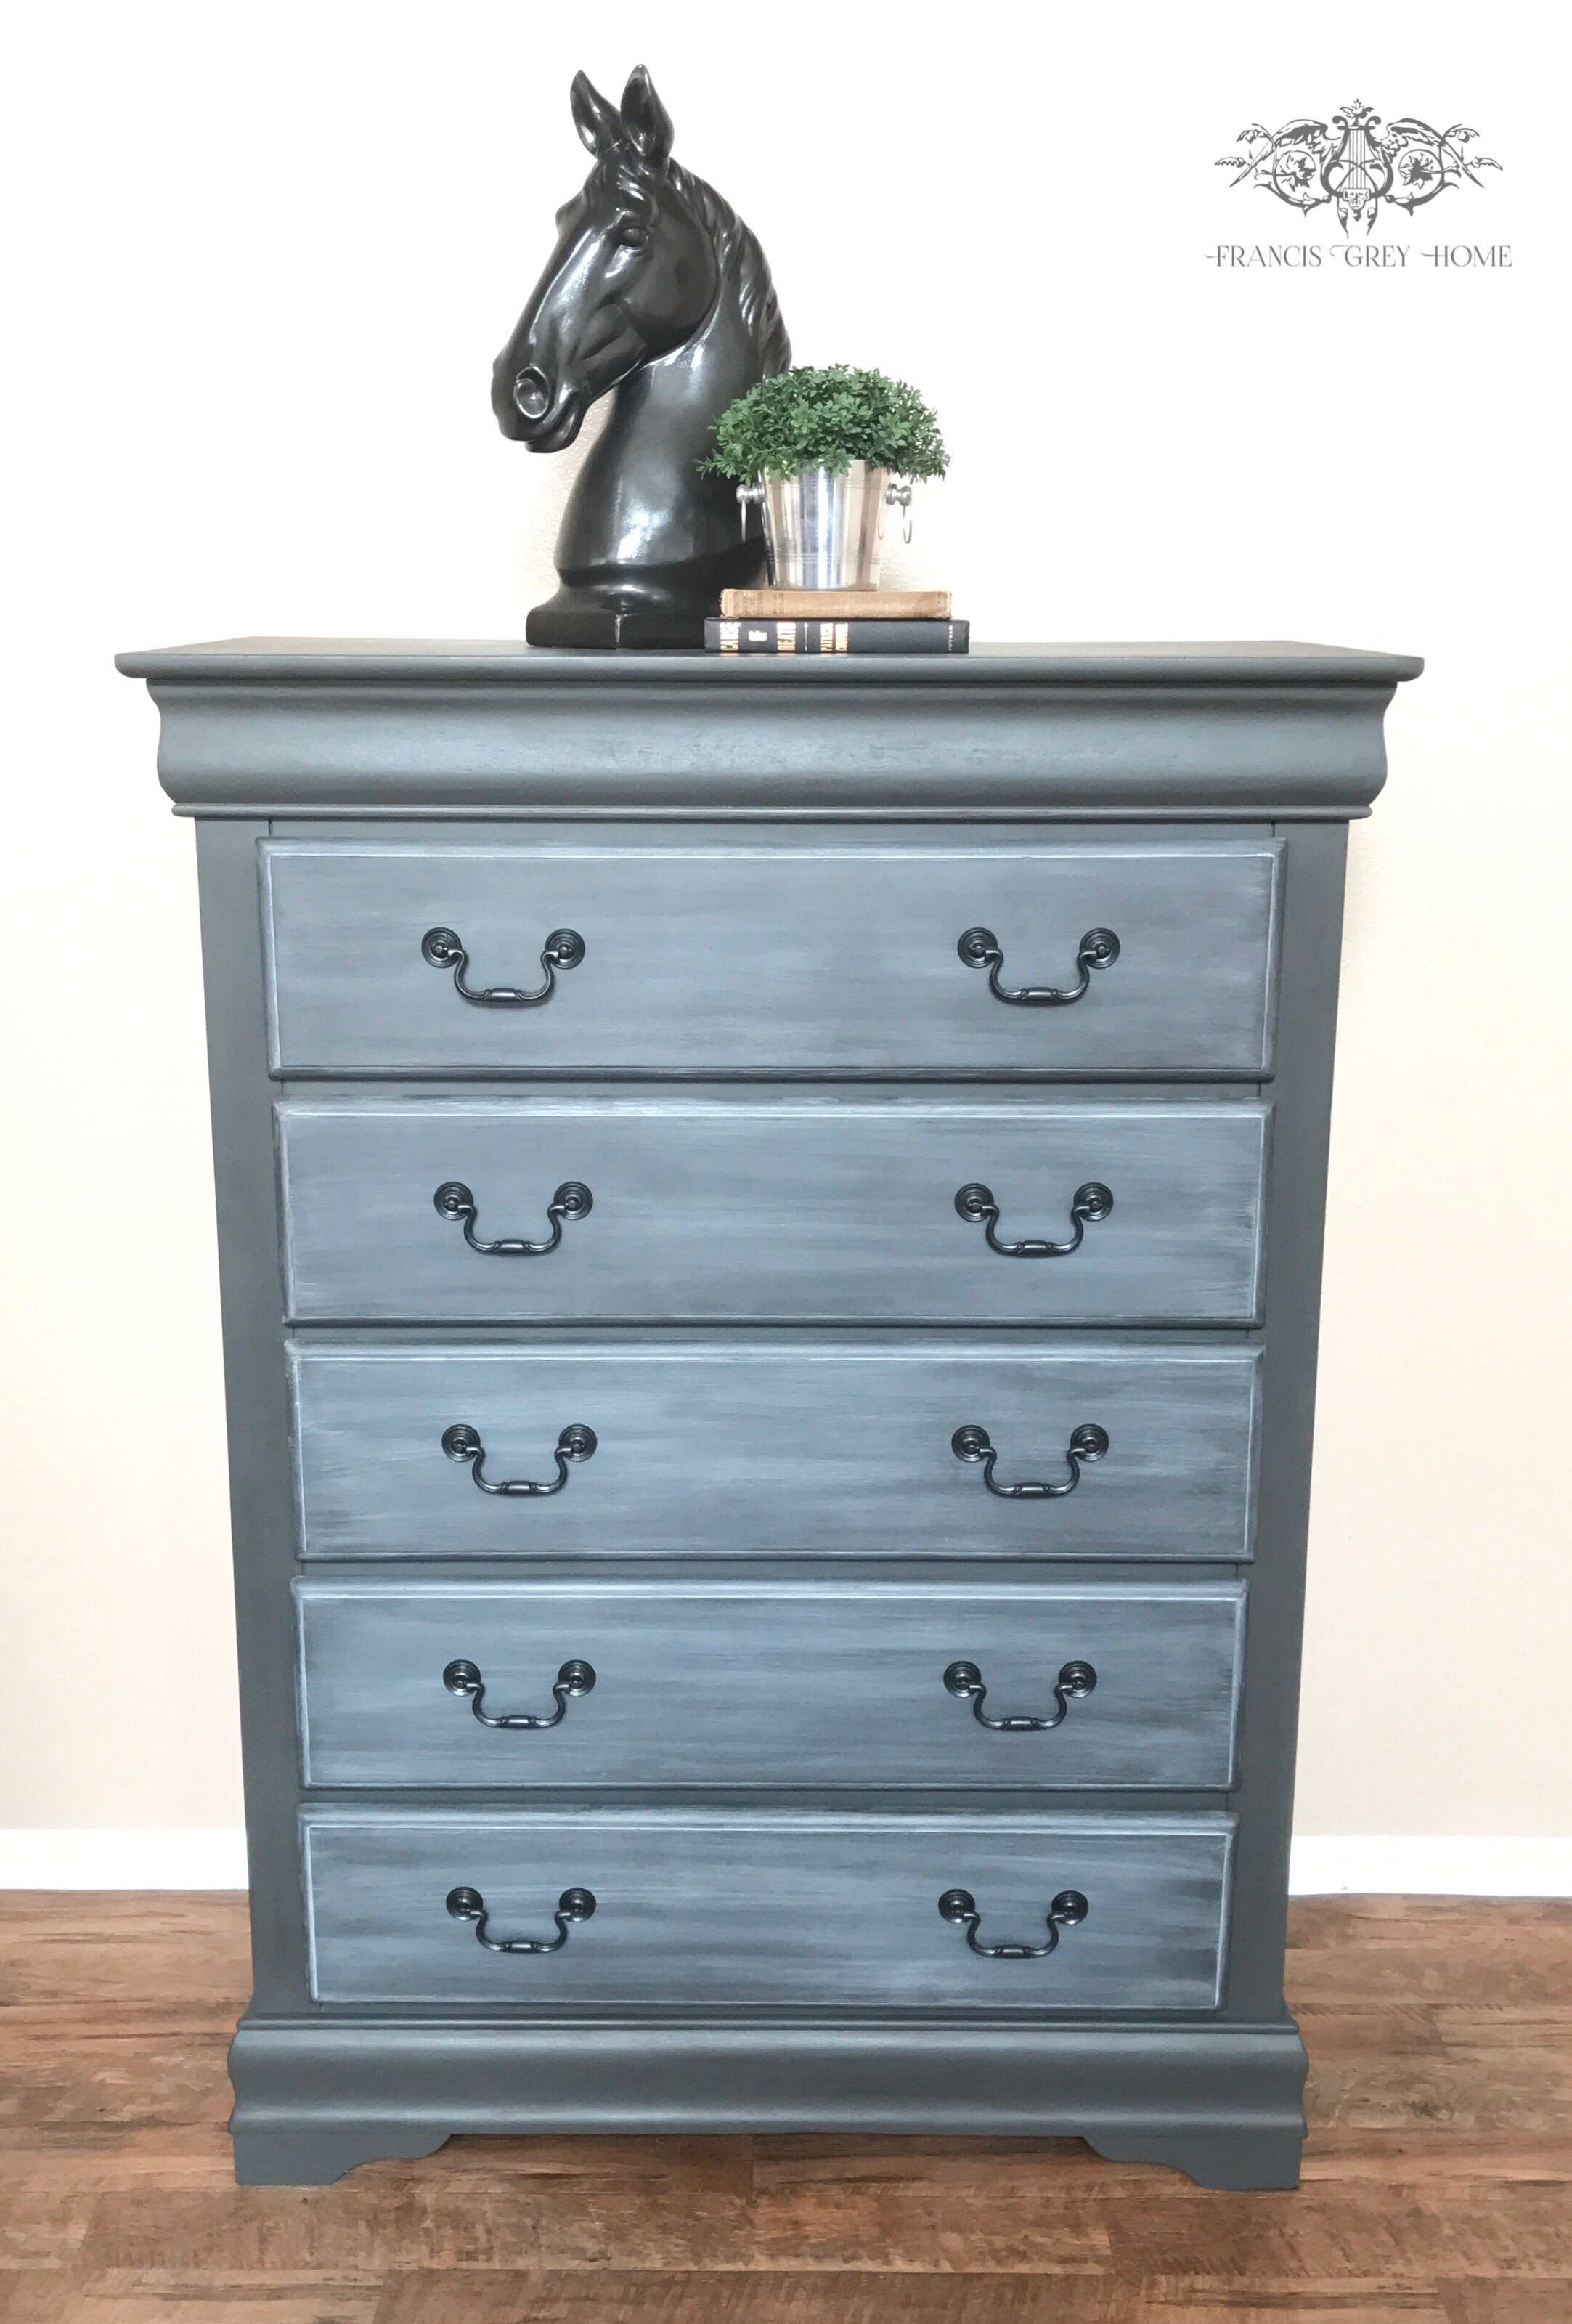 Tall Boy Makeover Chalk Paint Dresser Makeover Dark Grey Dresser Painted Furniture Dressers Makeover Grey Dresser Furniture Makeover [ 3200 x 2165 Pixel ]